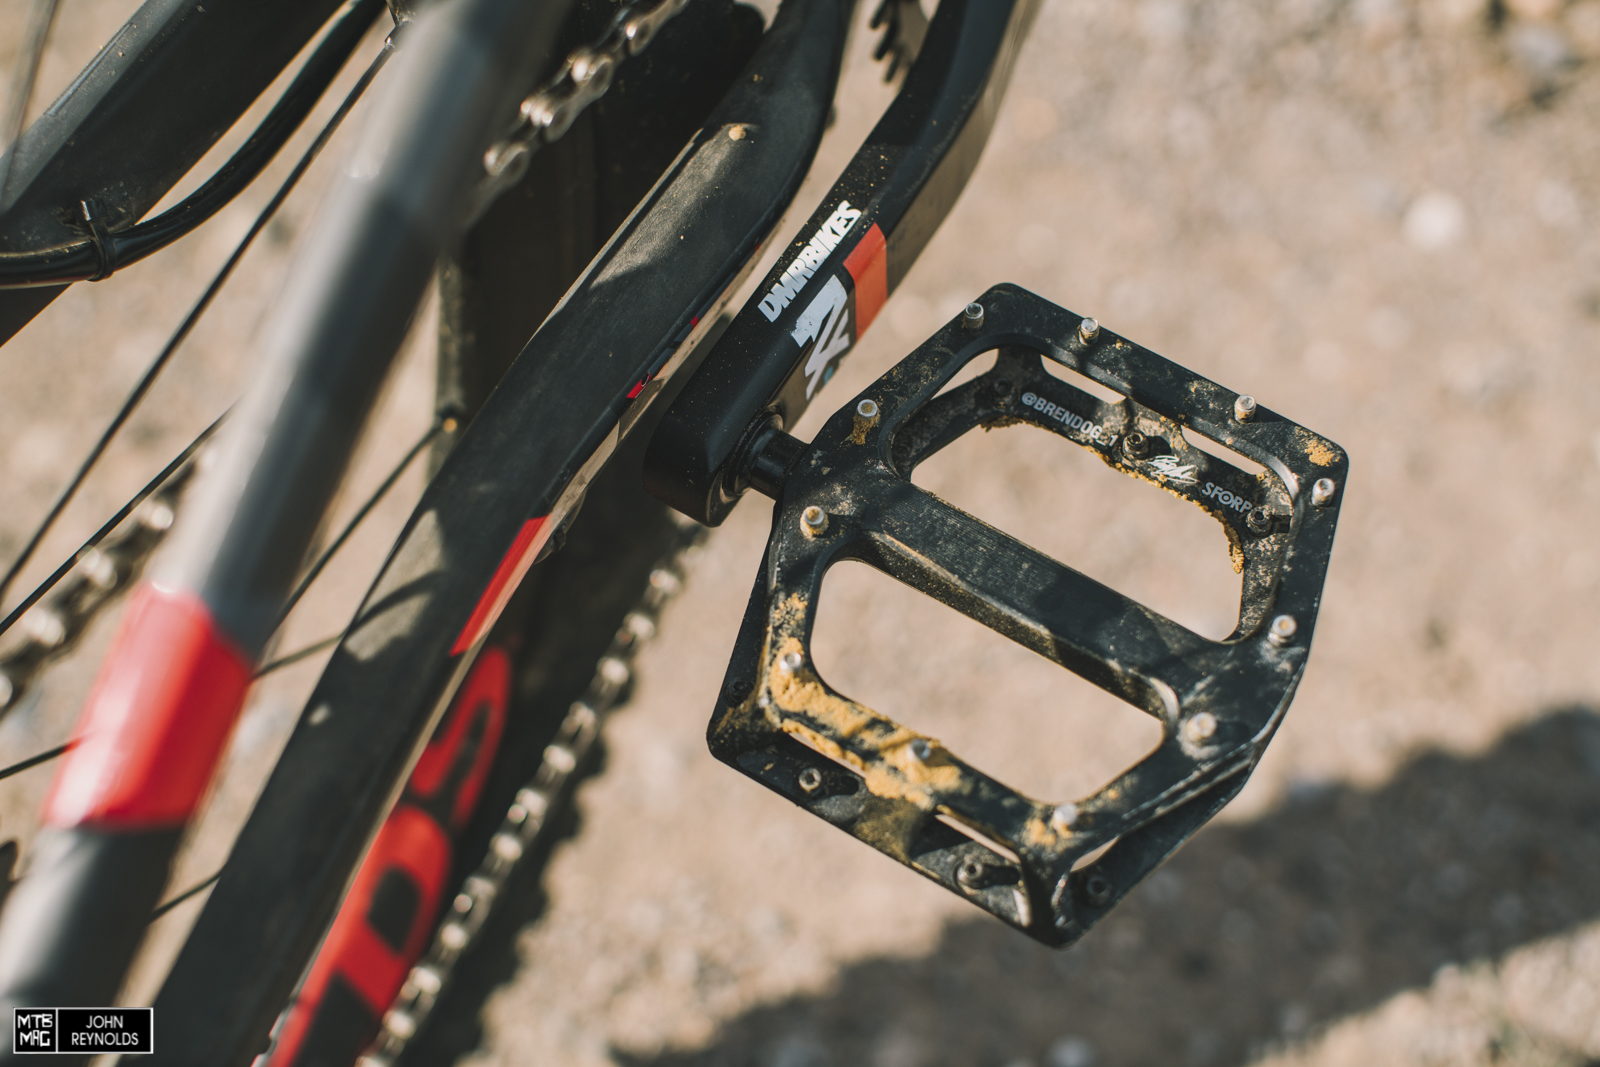 DMR Vault Brendog pedals.